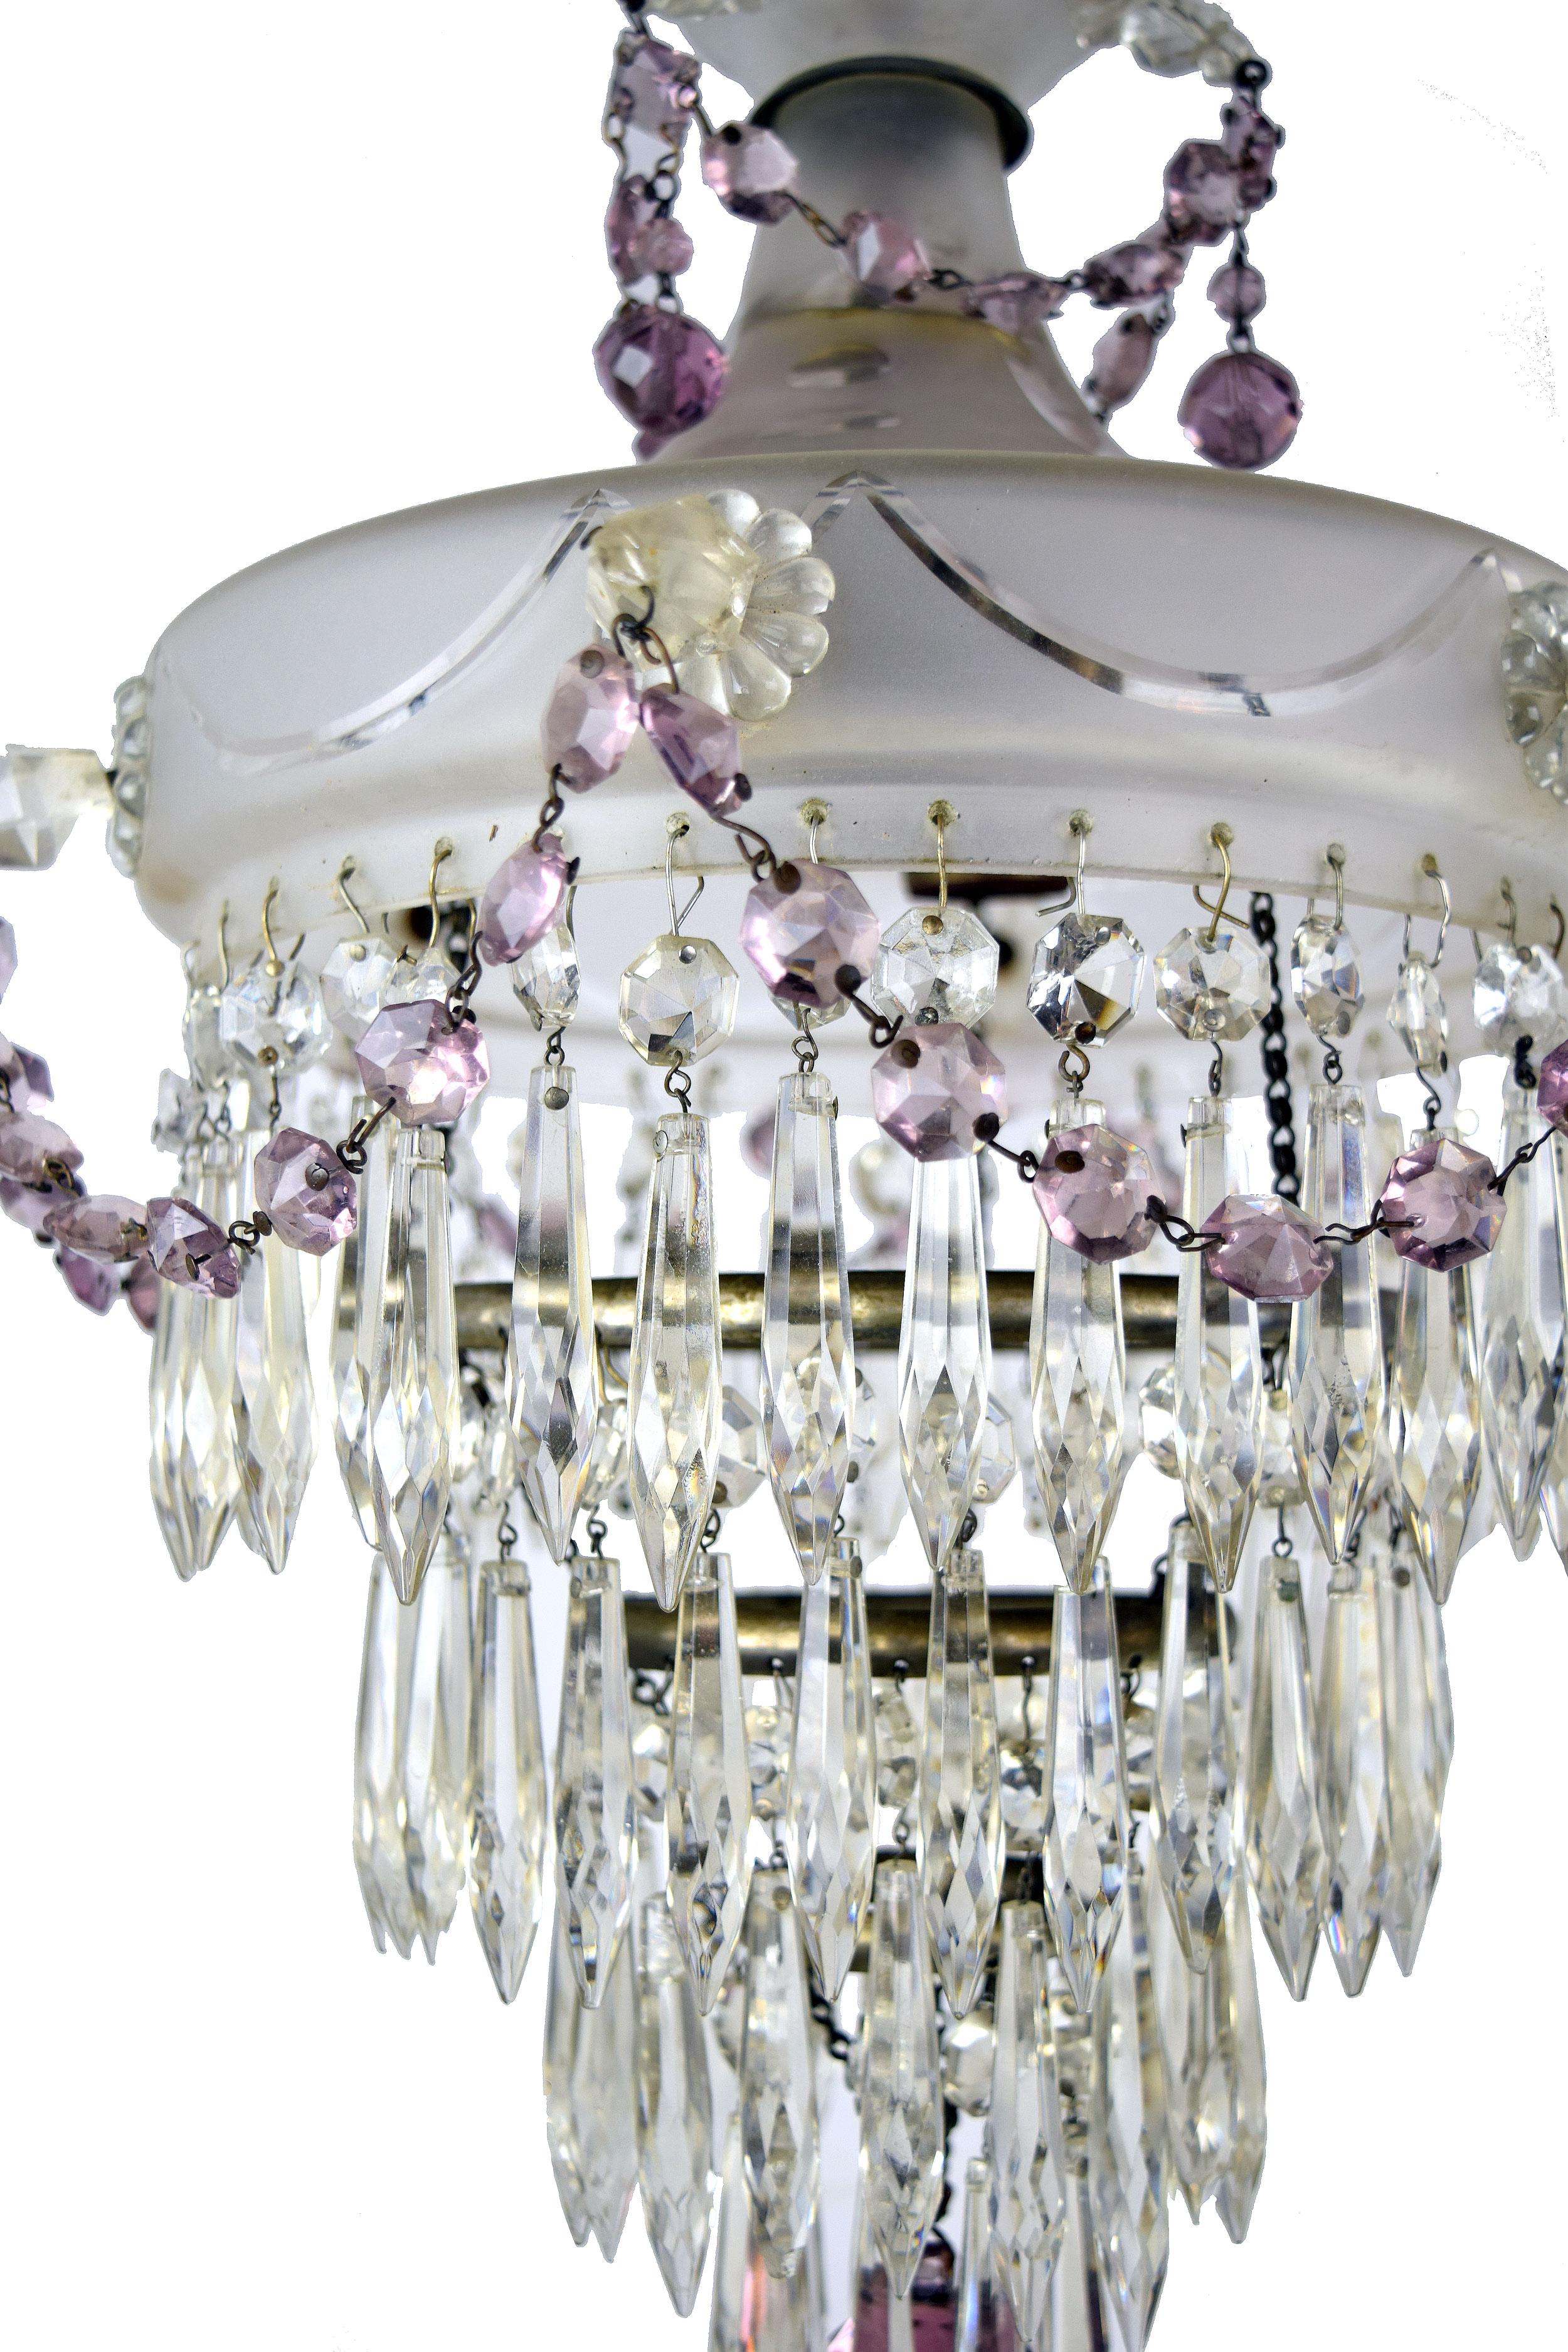 48083-glass-body-wedding-cake-sideviewt.jpg